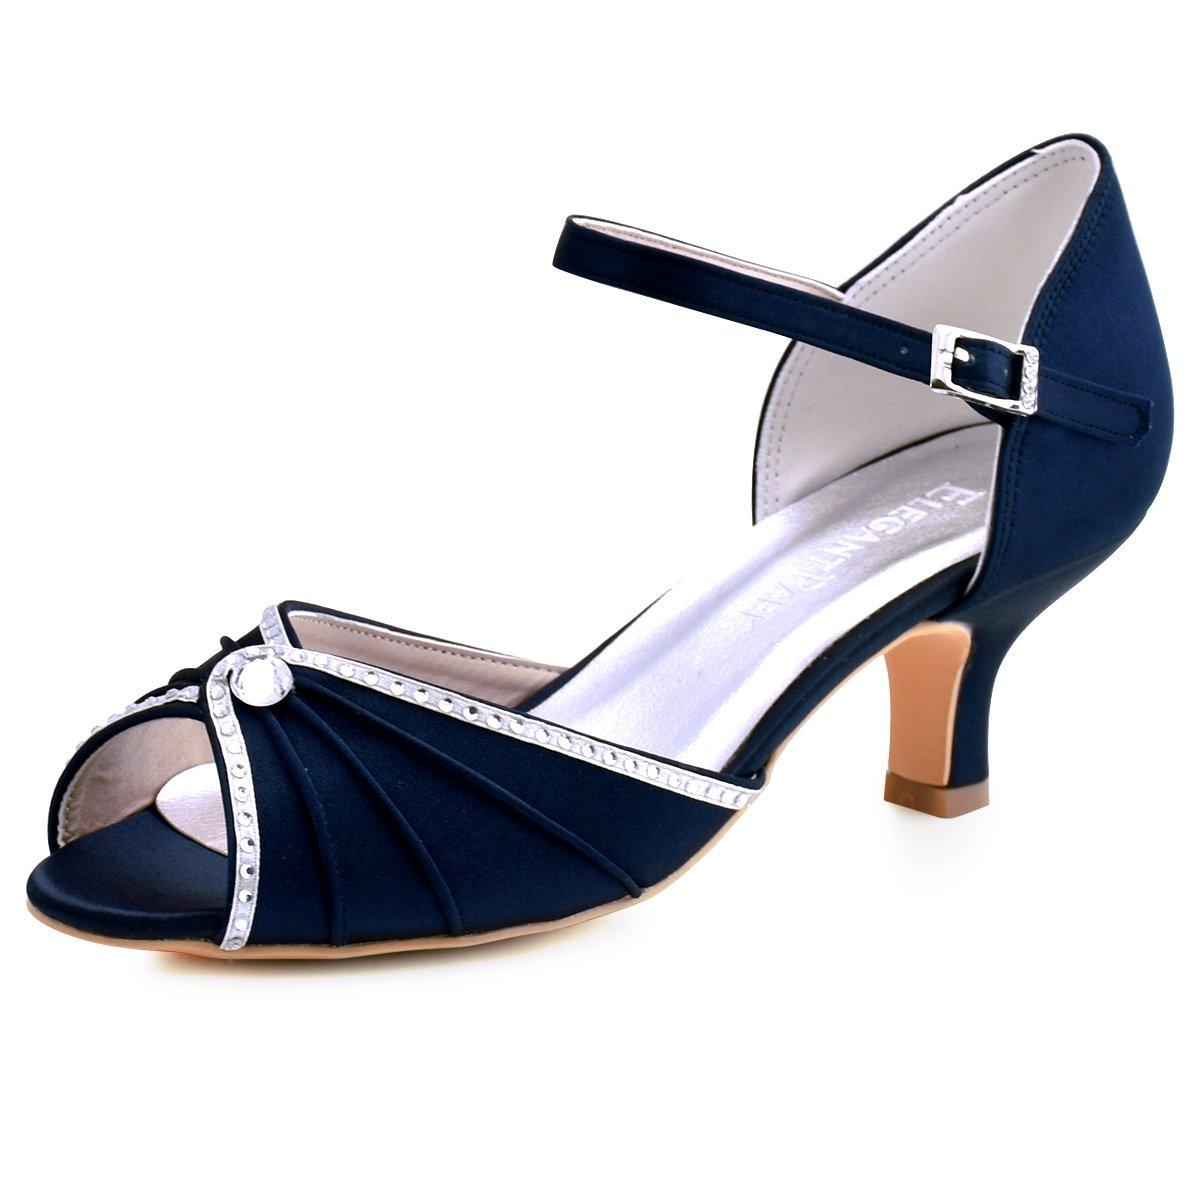 ElegantPark Talon HP1623 B075S1N4N9 Escarpins Satin Bout ouvert Diamant bal Talon Bas Sandales chaussures de mariee bal Bleu Marine 2667093 - automaticcouplings.space